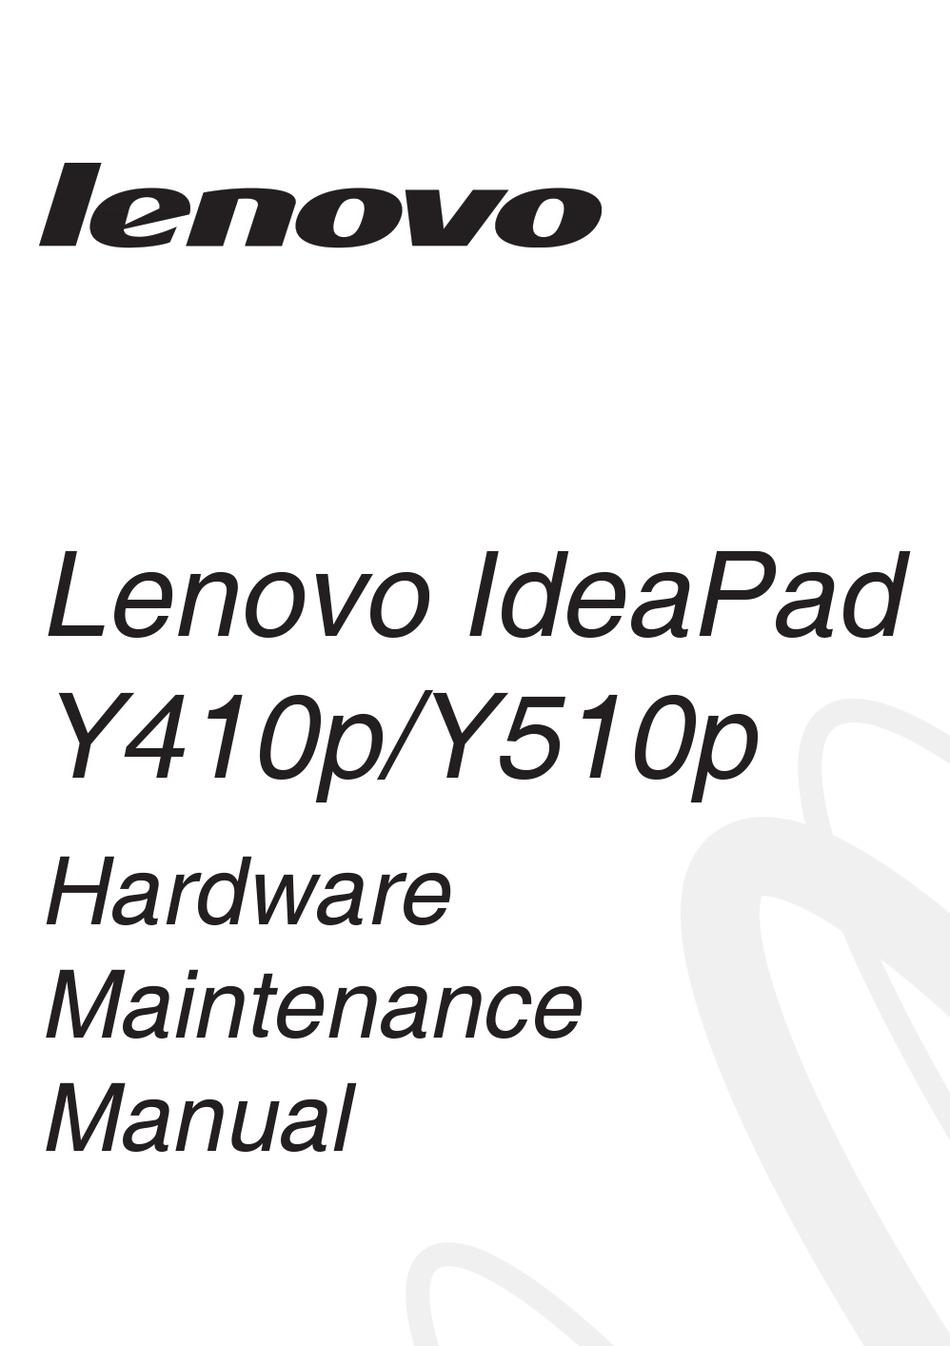 LENOVO IDEAPAD Y410P HARDWARE MAINTENANCE MANUAL Pdf